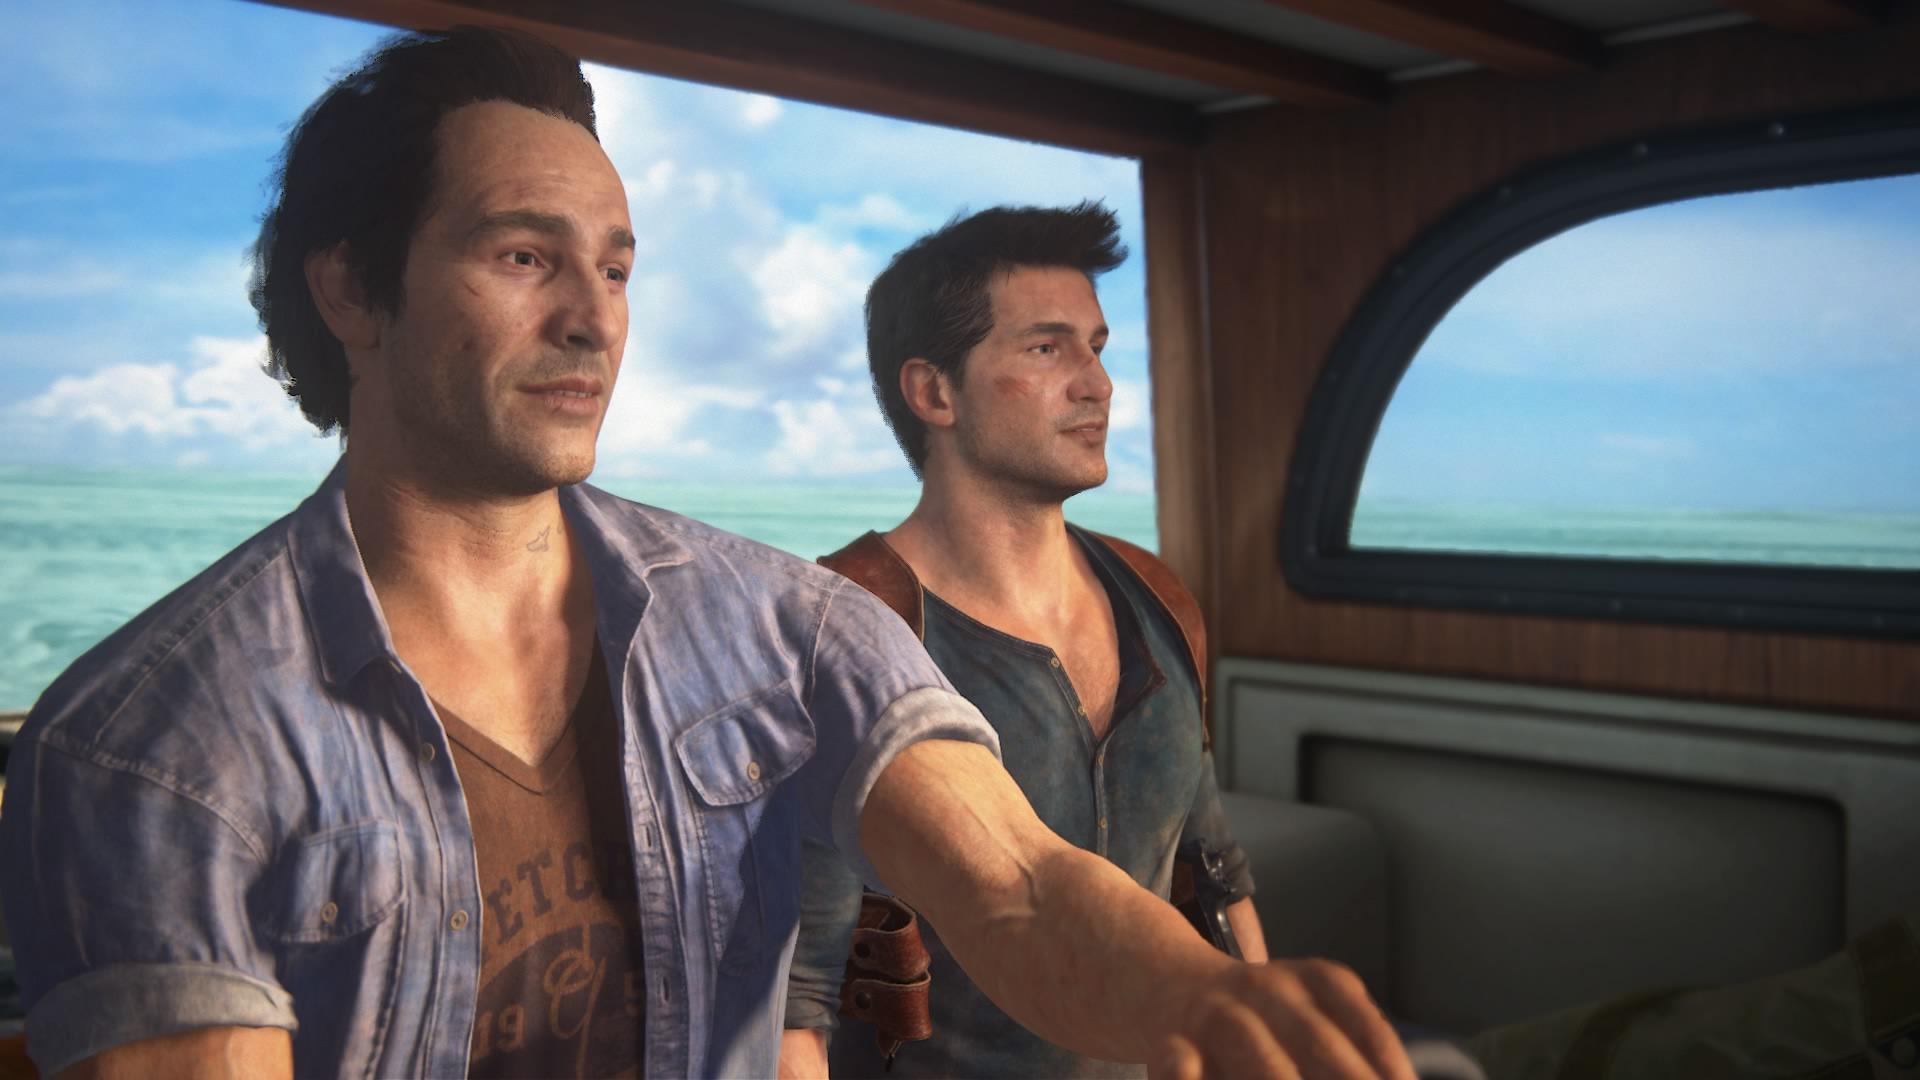 Image courtesy of Sony Interactive Entertainment | Naughty Dog